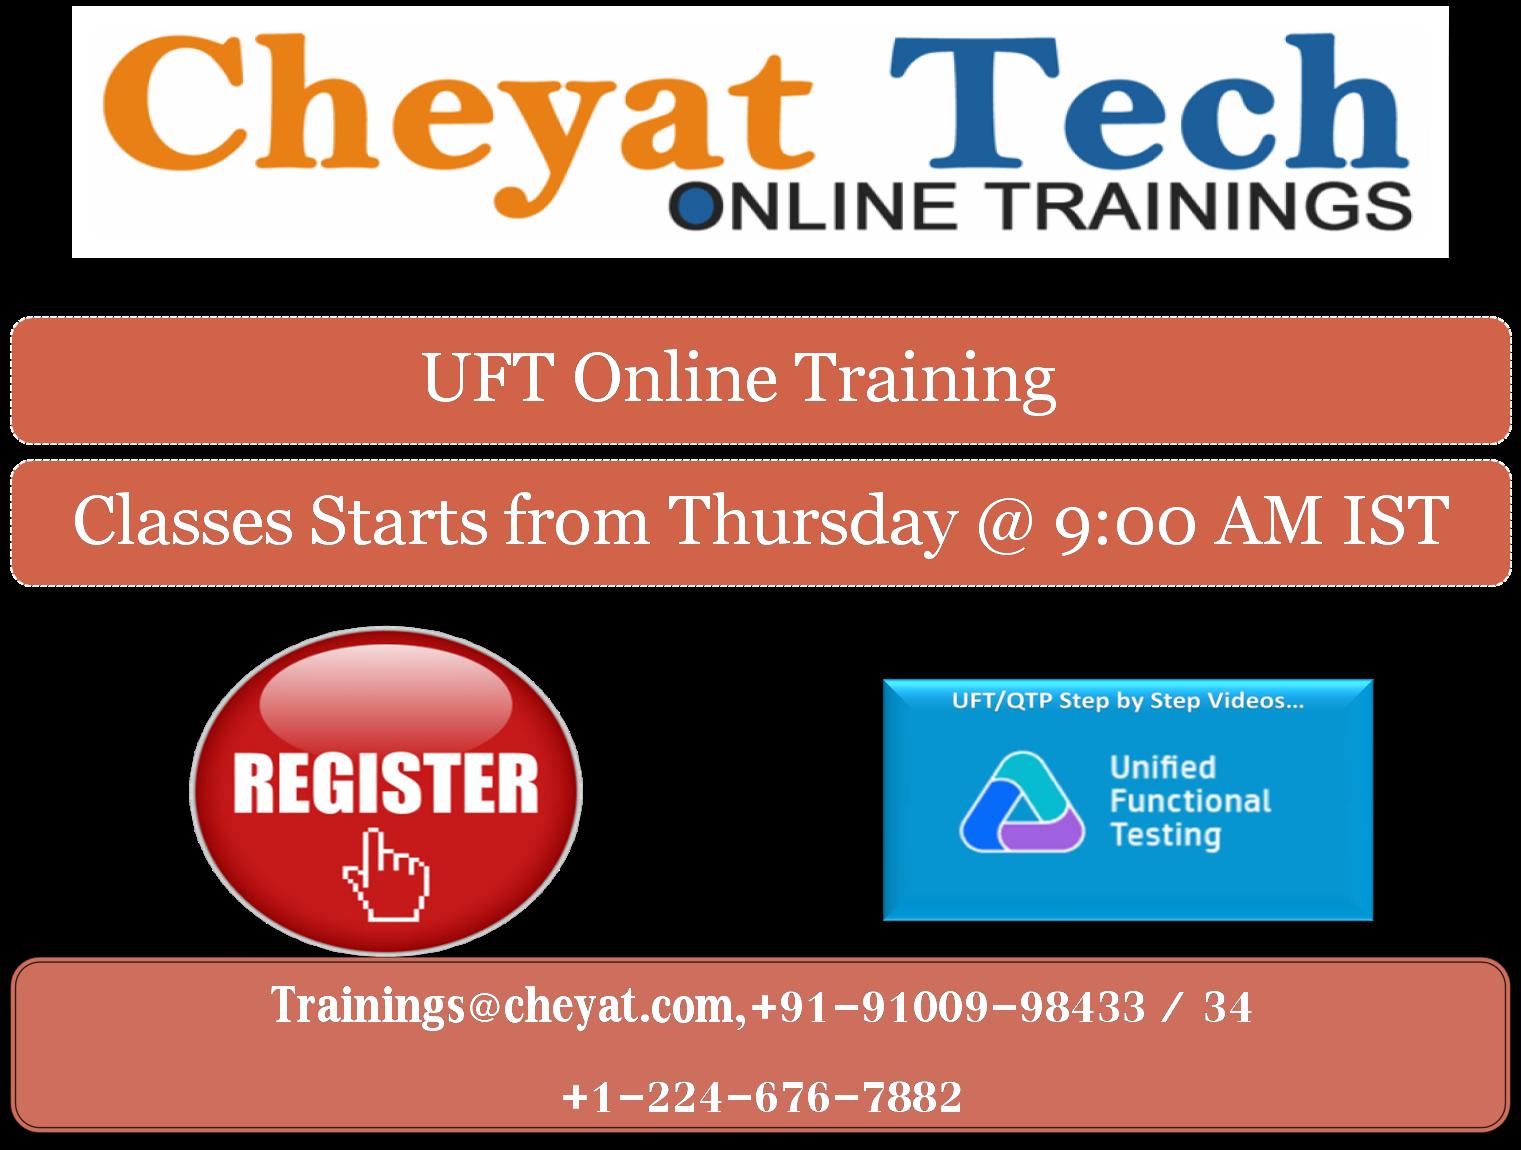 The Best UFT Online Training Institute – Cheyat Tech